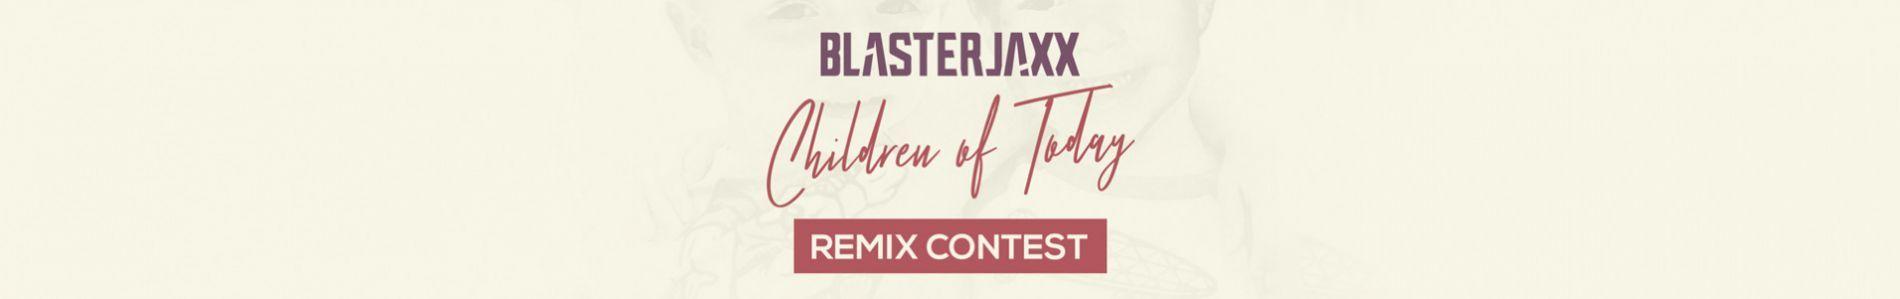 Remix Blasterjaxx' 'Children of Today' and win a FL Studio package!